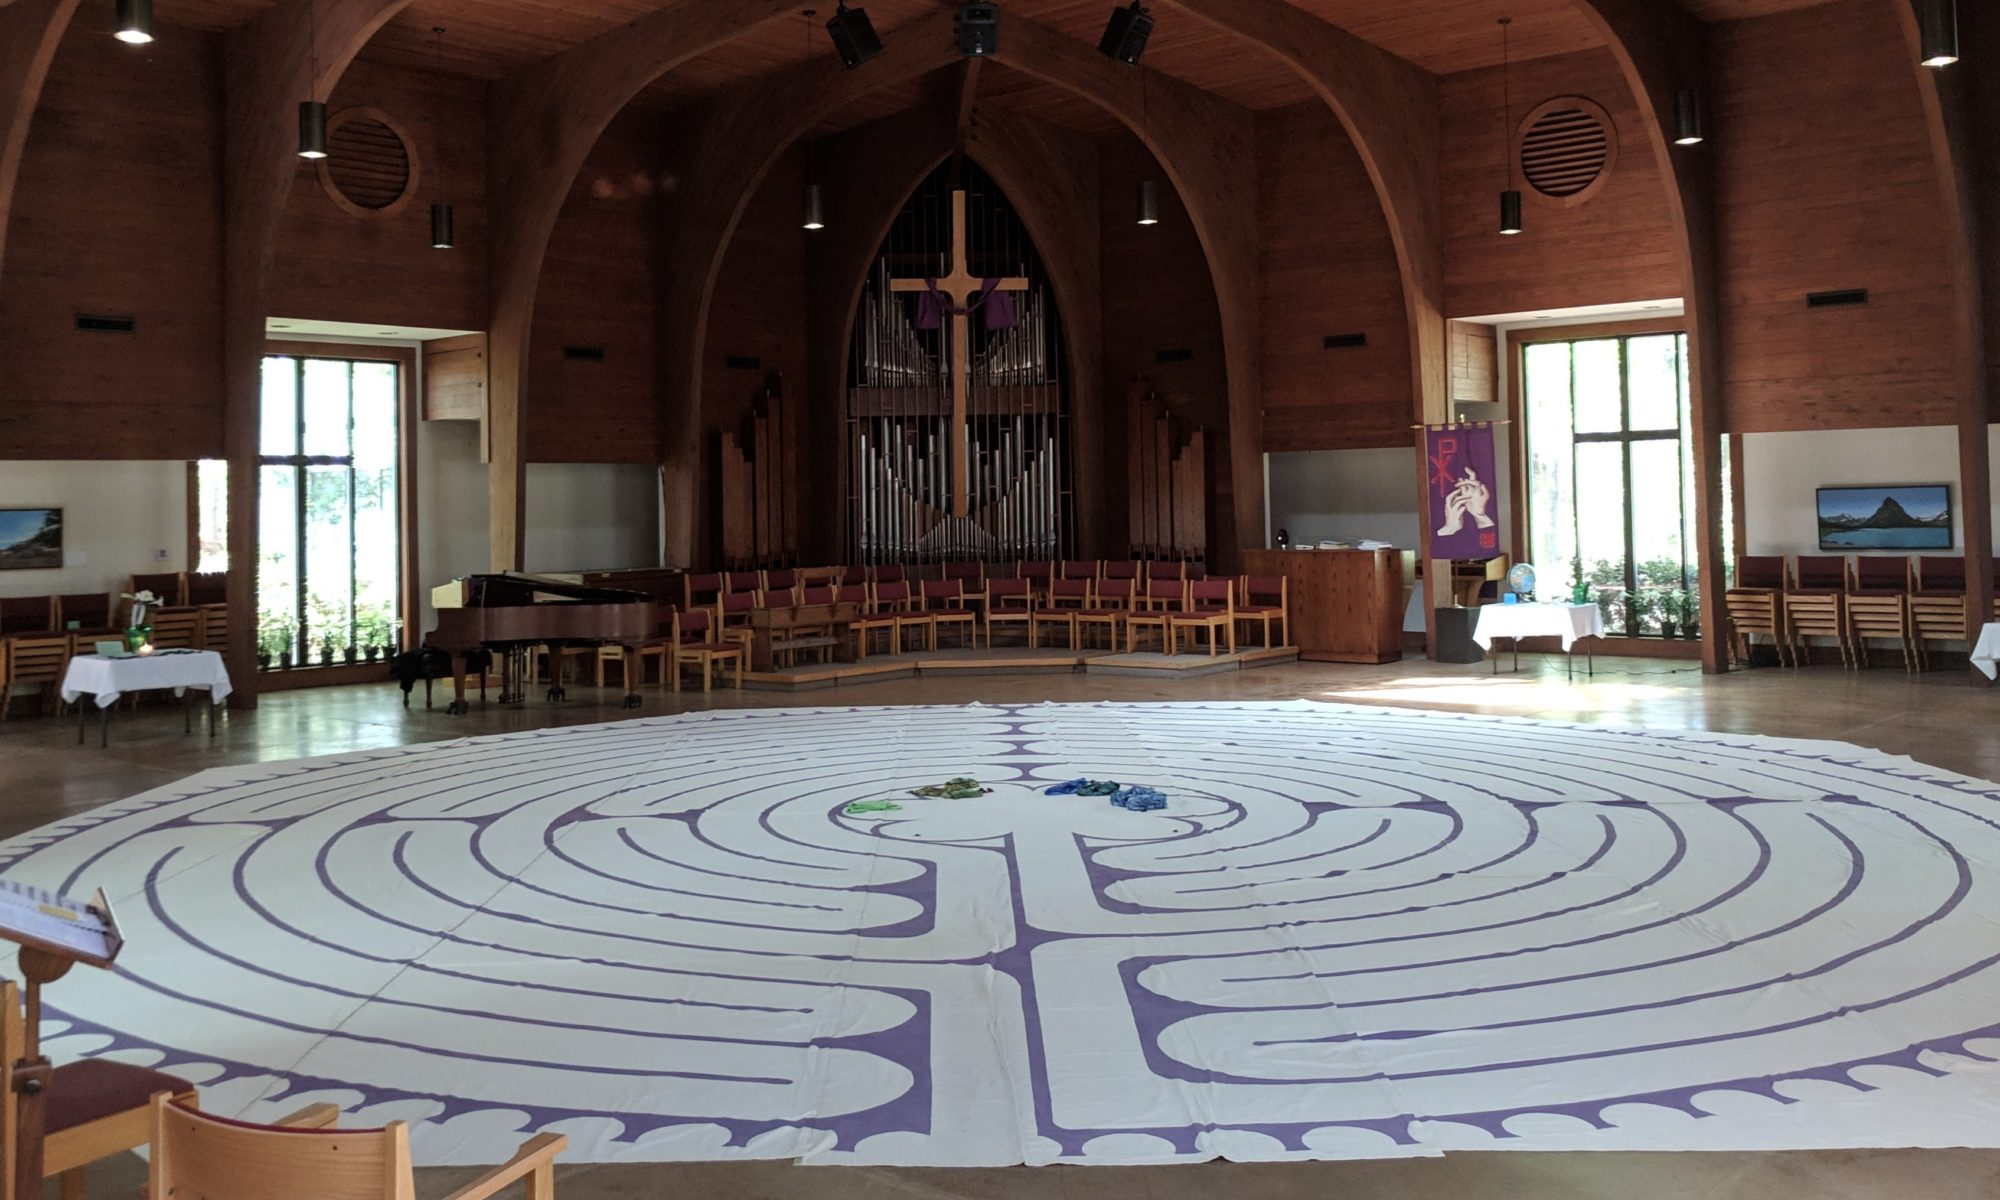 Labyrinth at Olin T. Binkley Baptist Church, Chapel Hill, NC